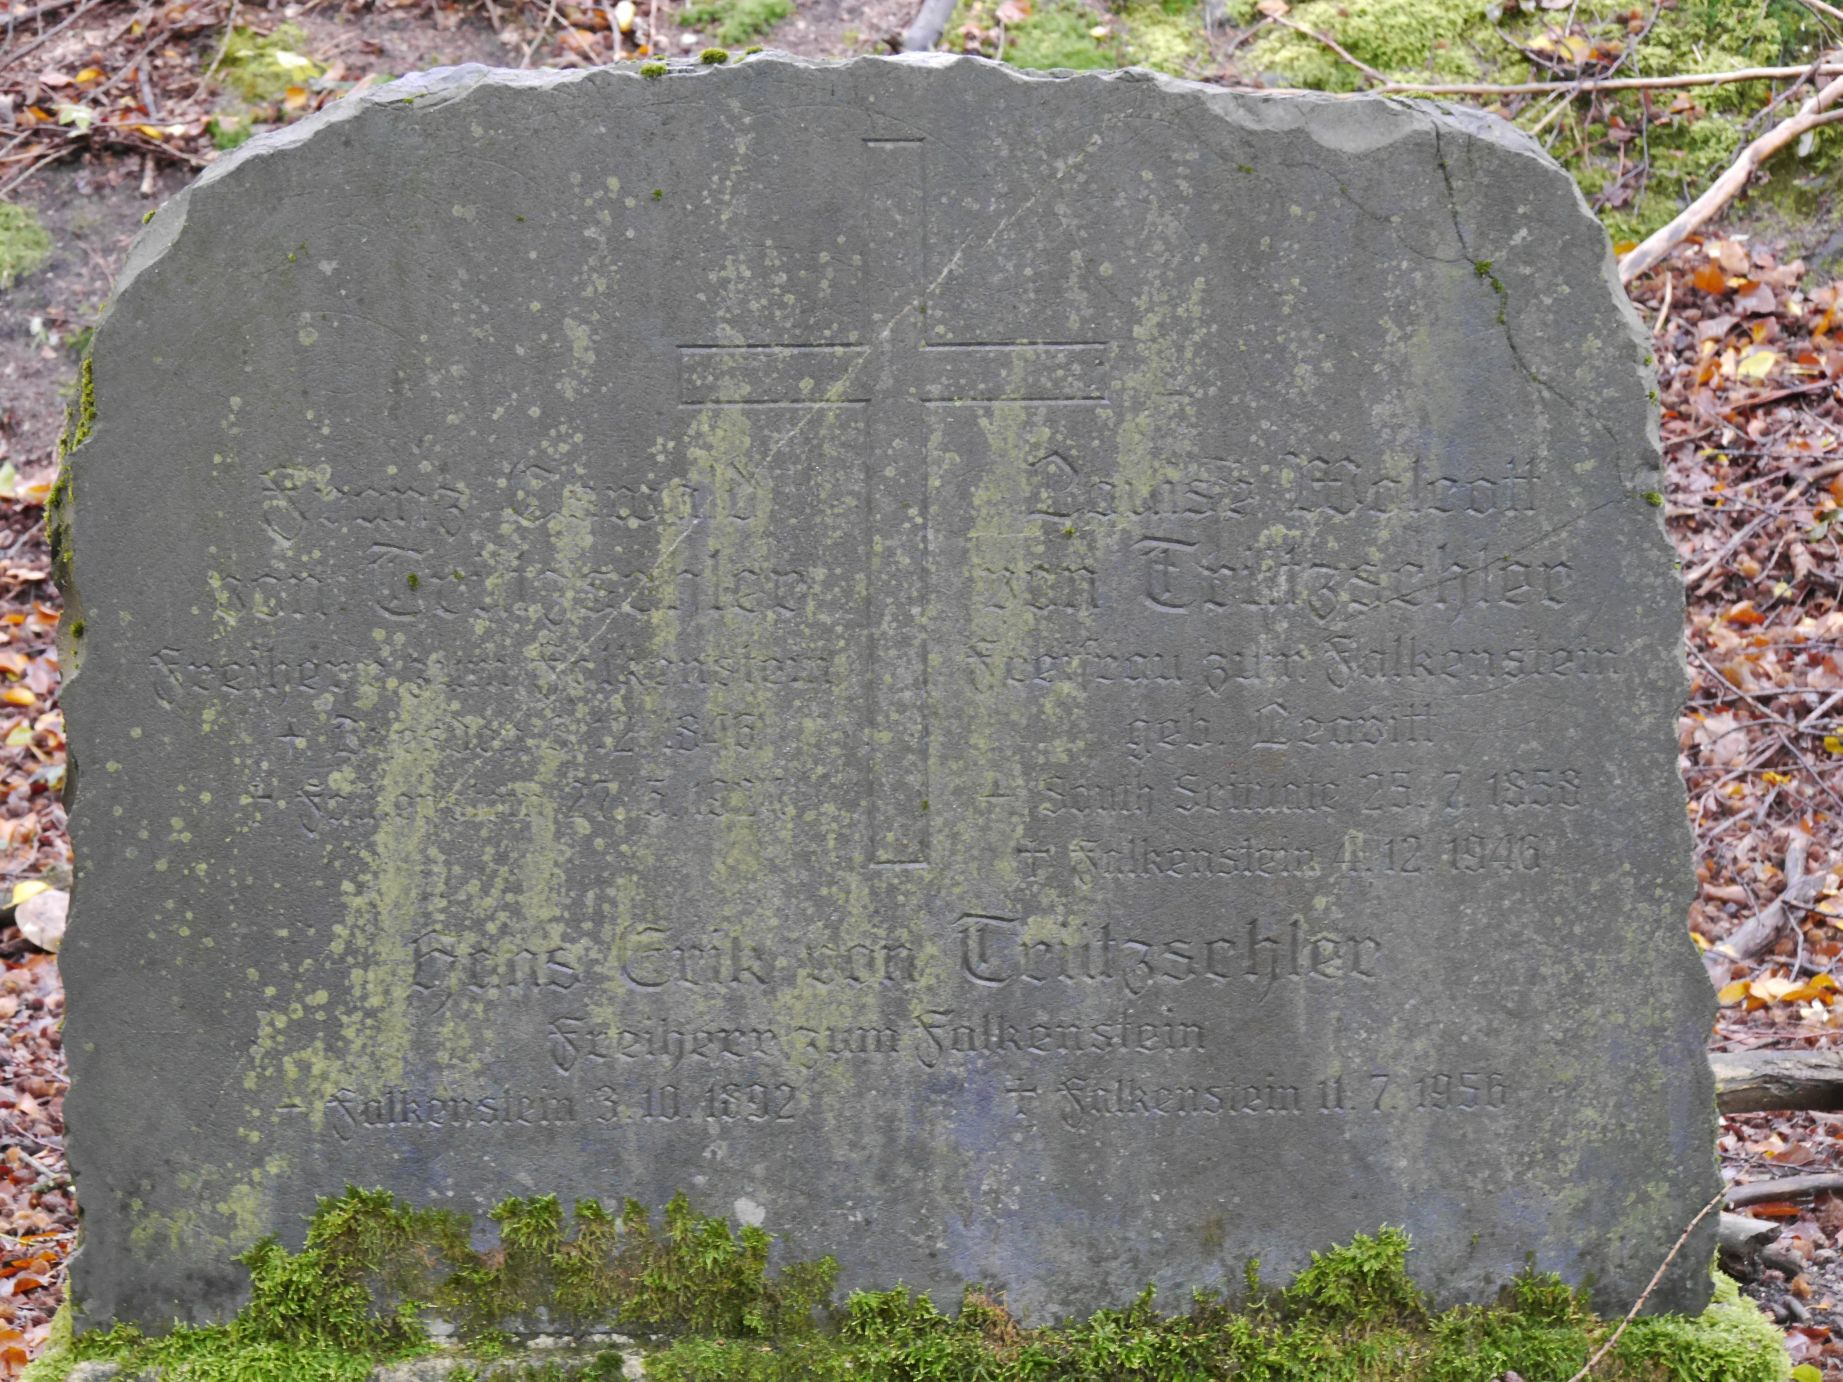 Trützschlers Grab